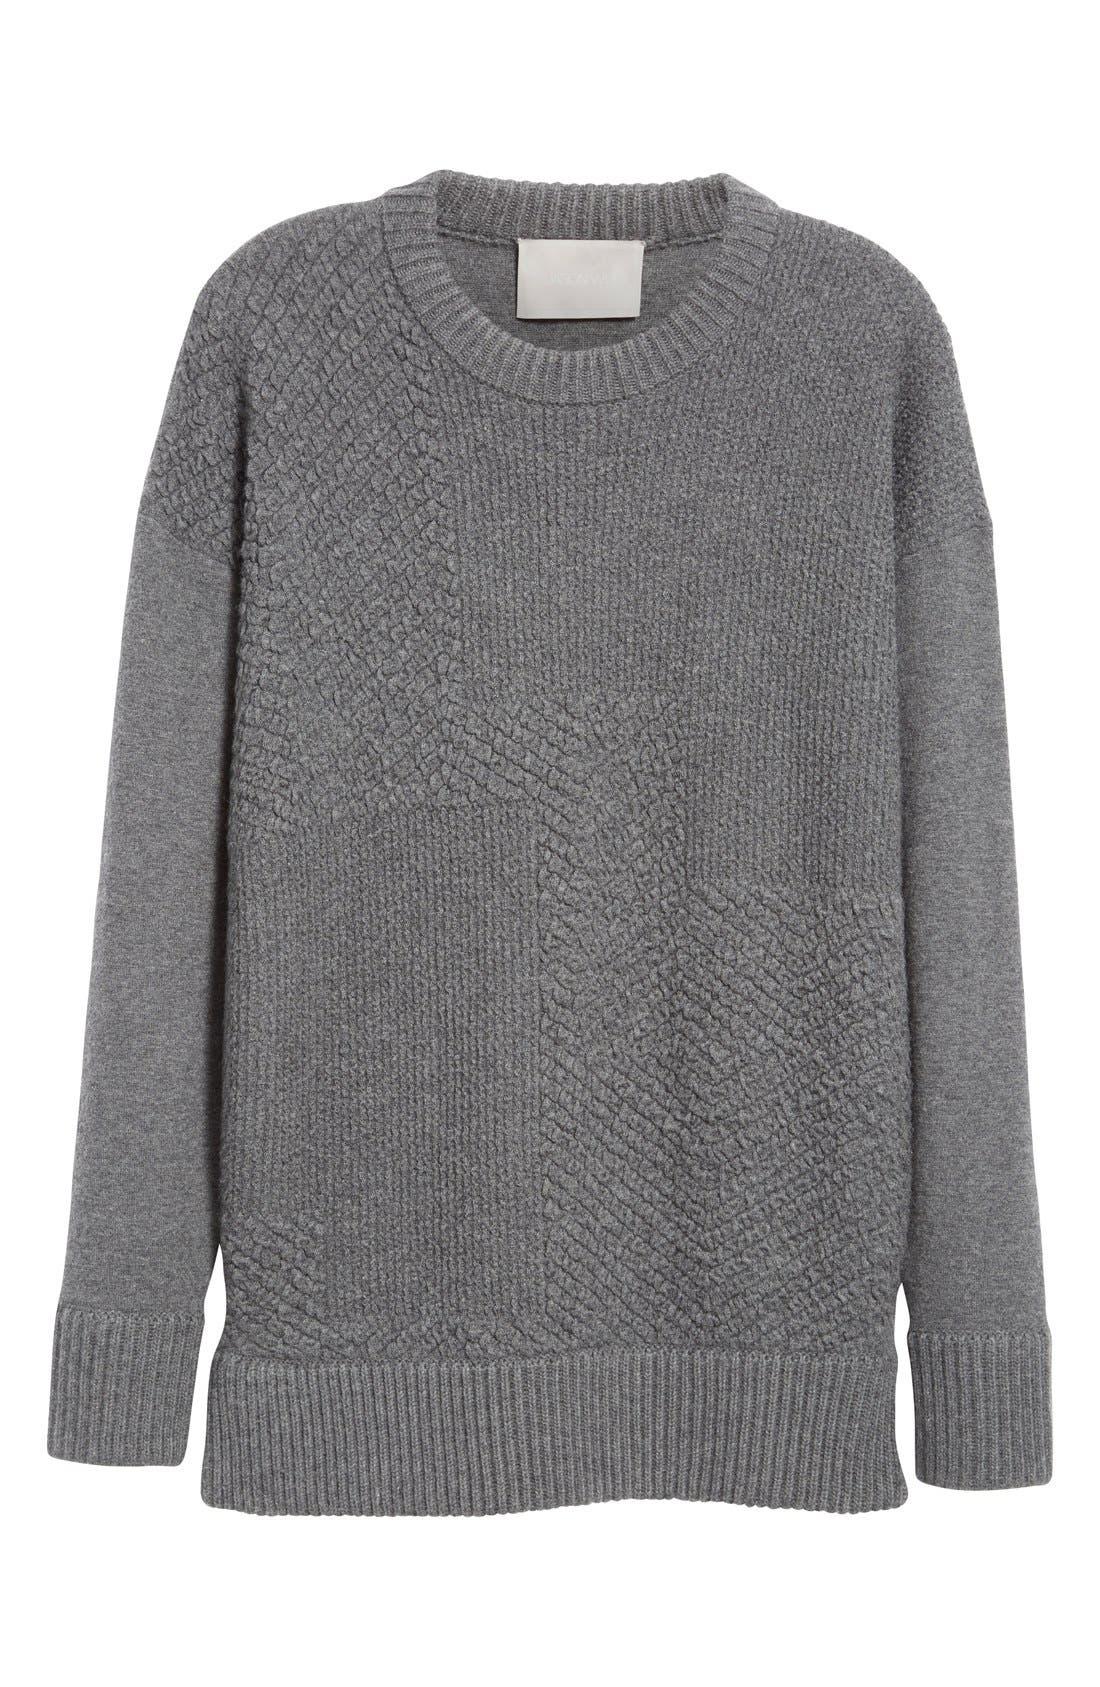 Alternate Image 4  - Jason Wu Cashmere & Wool Blend Textured Sweater